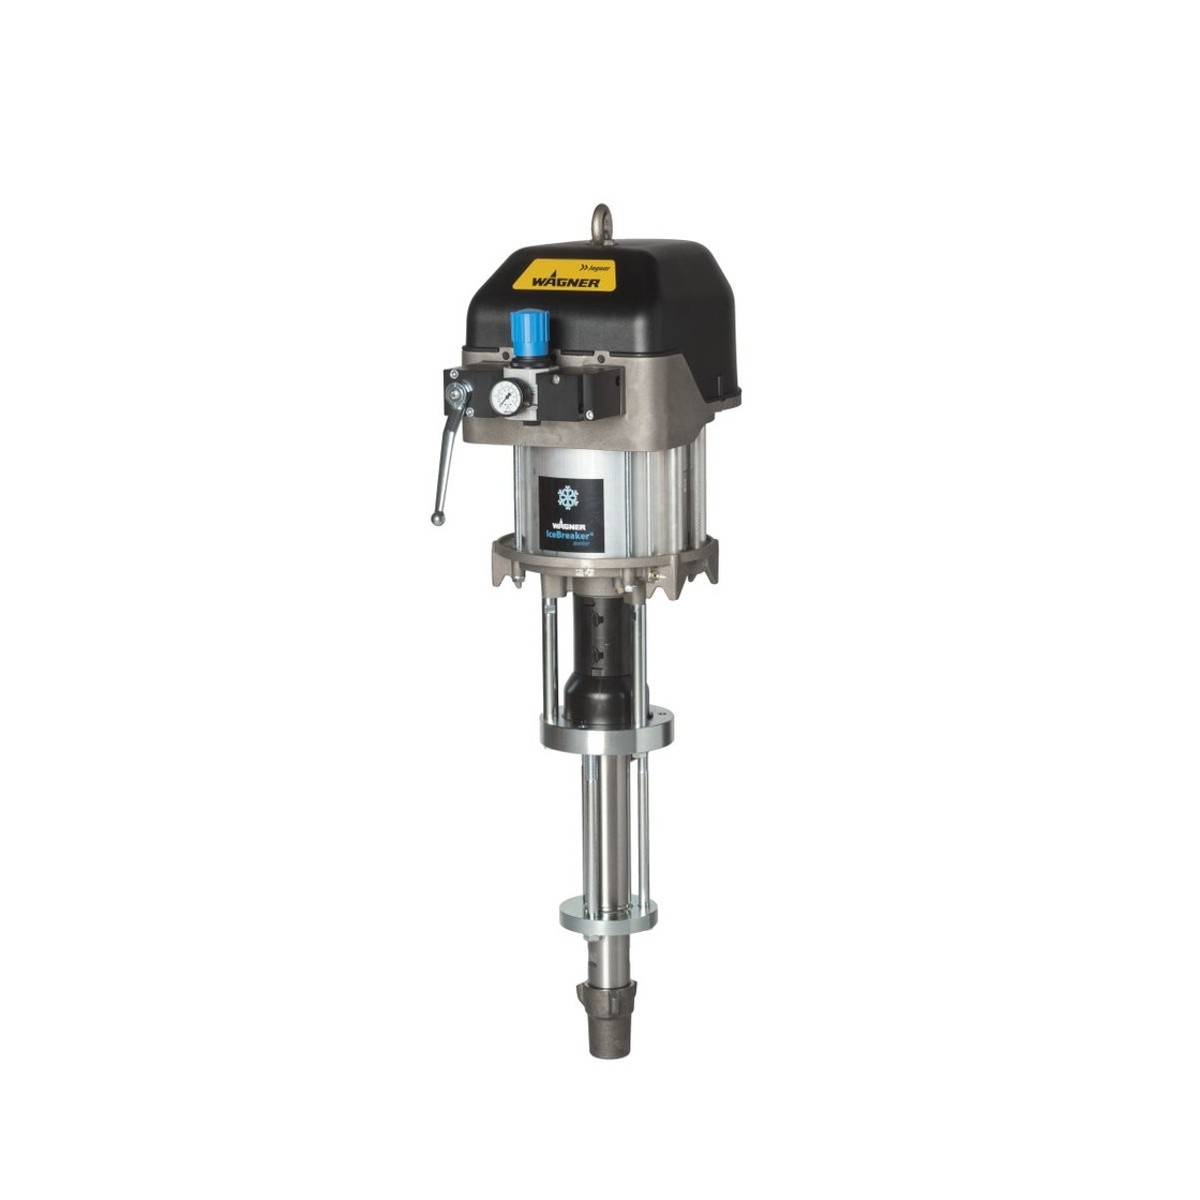 High Pressure Piston Pump : Wagner jaguar high pressure piston pump